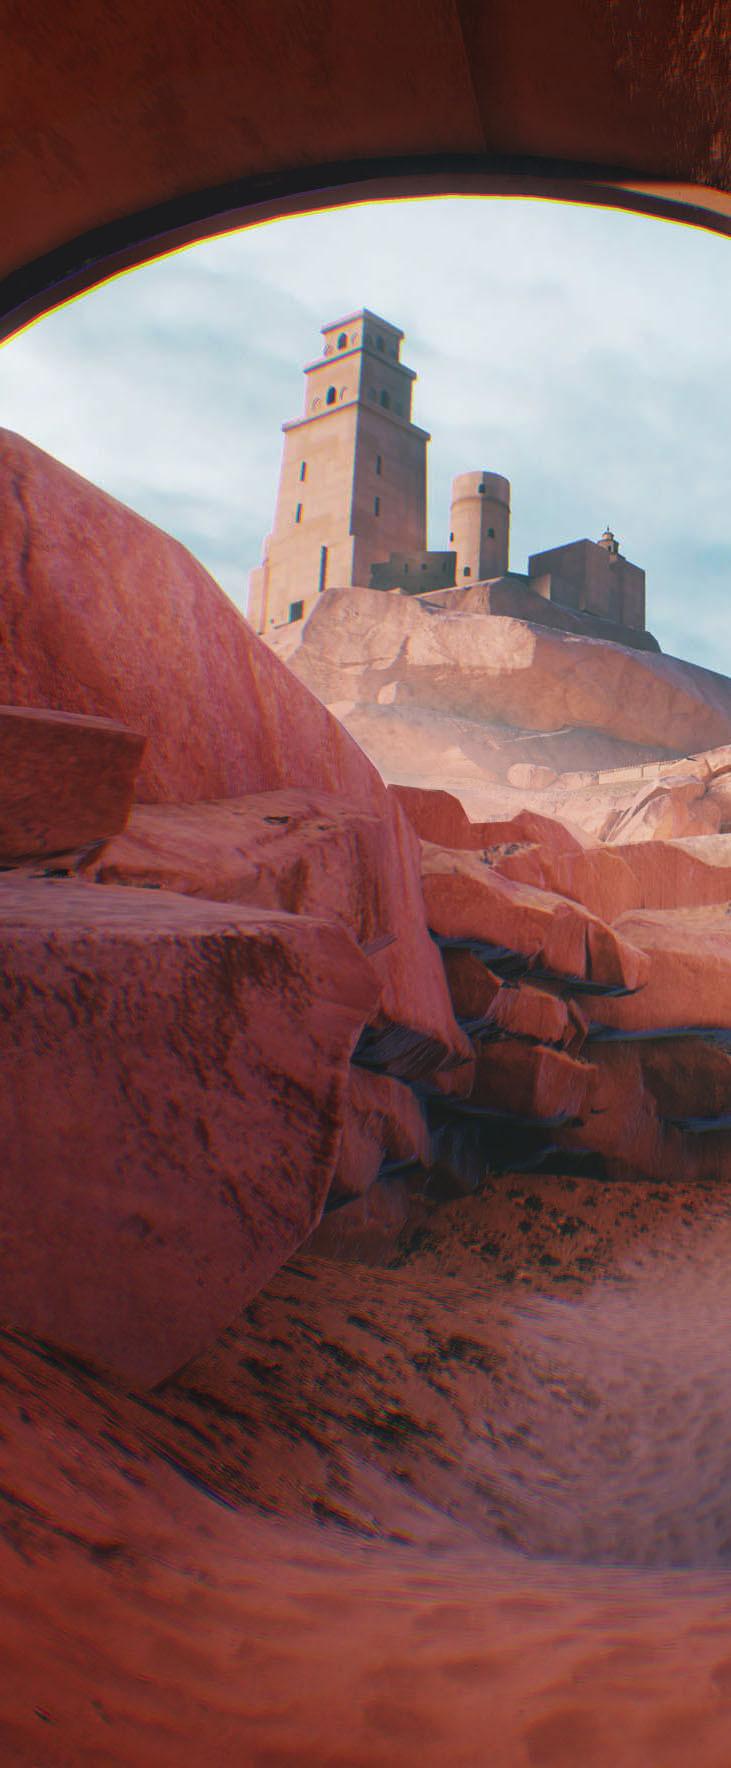 Florian thomasset desert temple 18